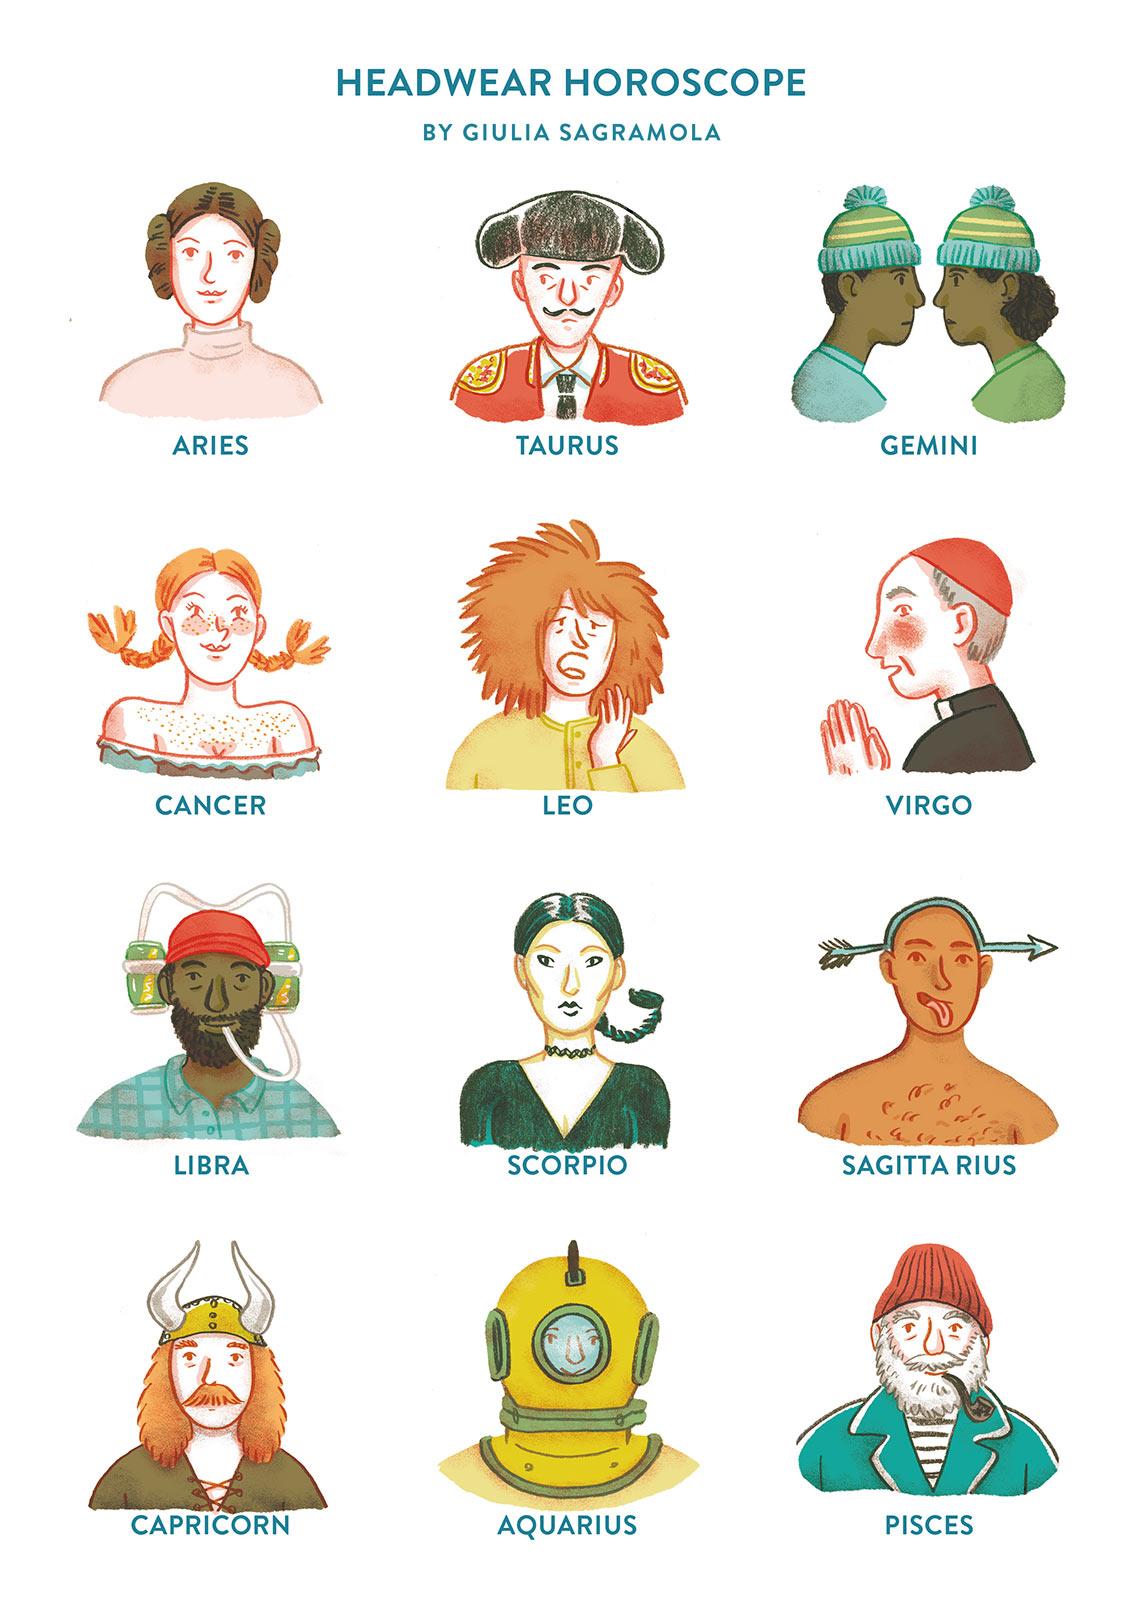 giuliasagramola_headwear_horoscope1140px